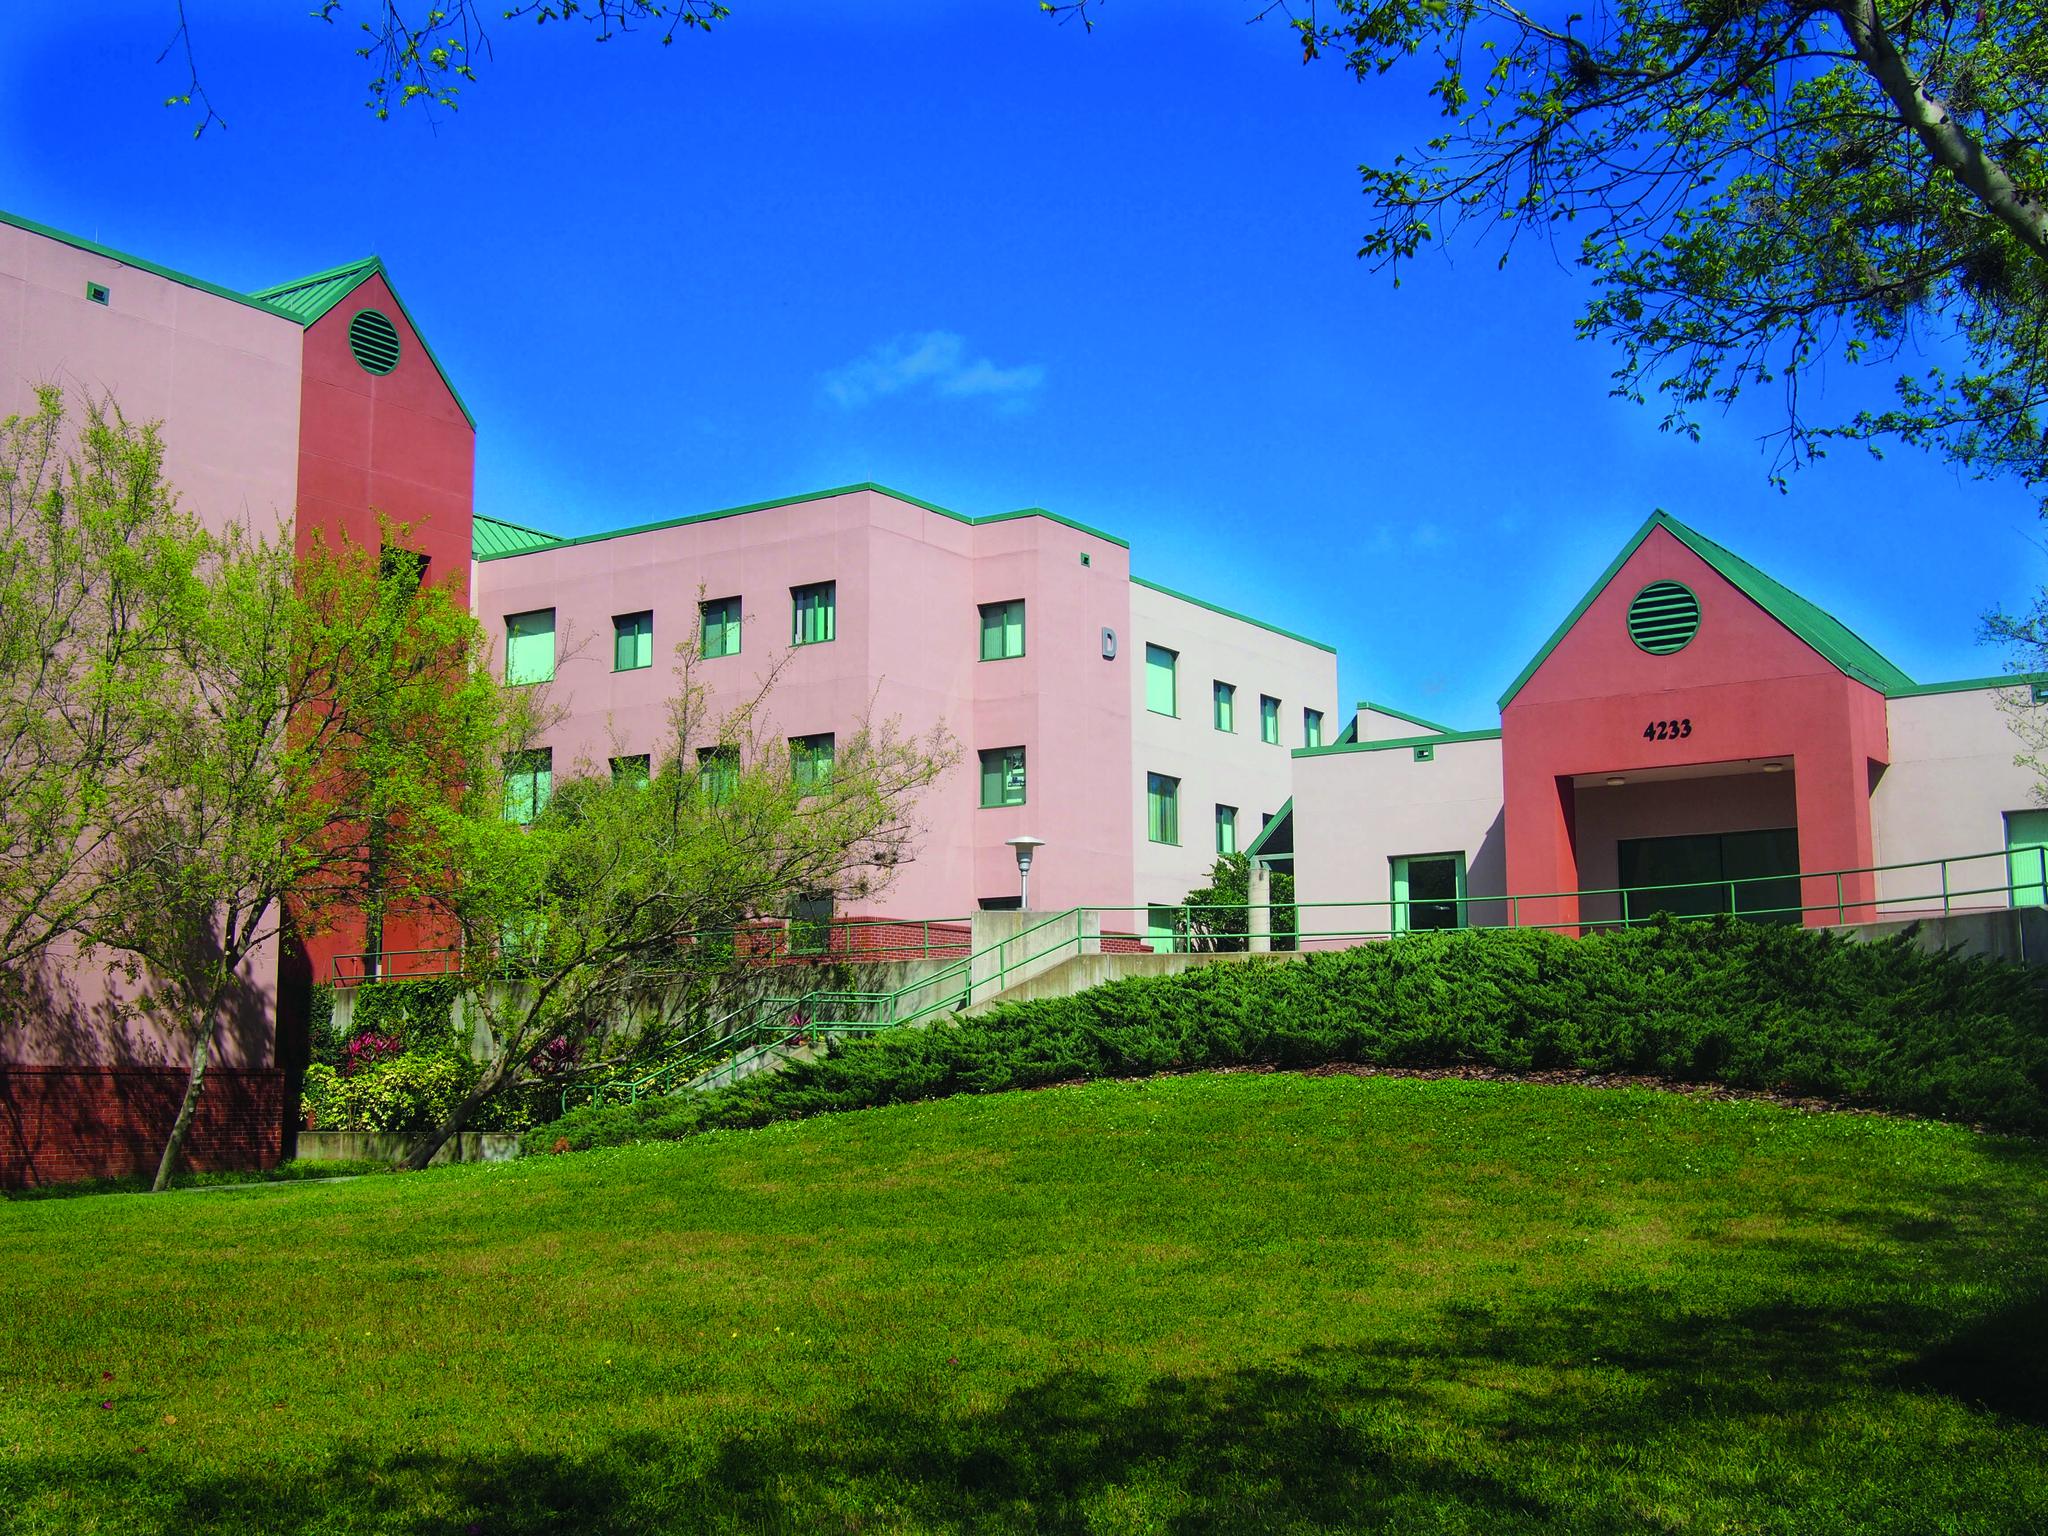 Holly apartments at University of South Florida